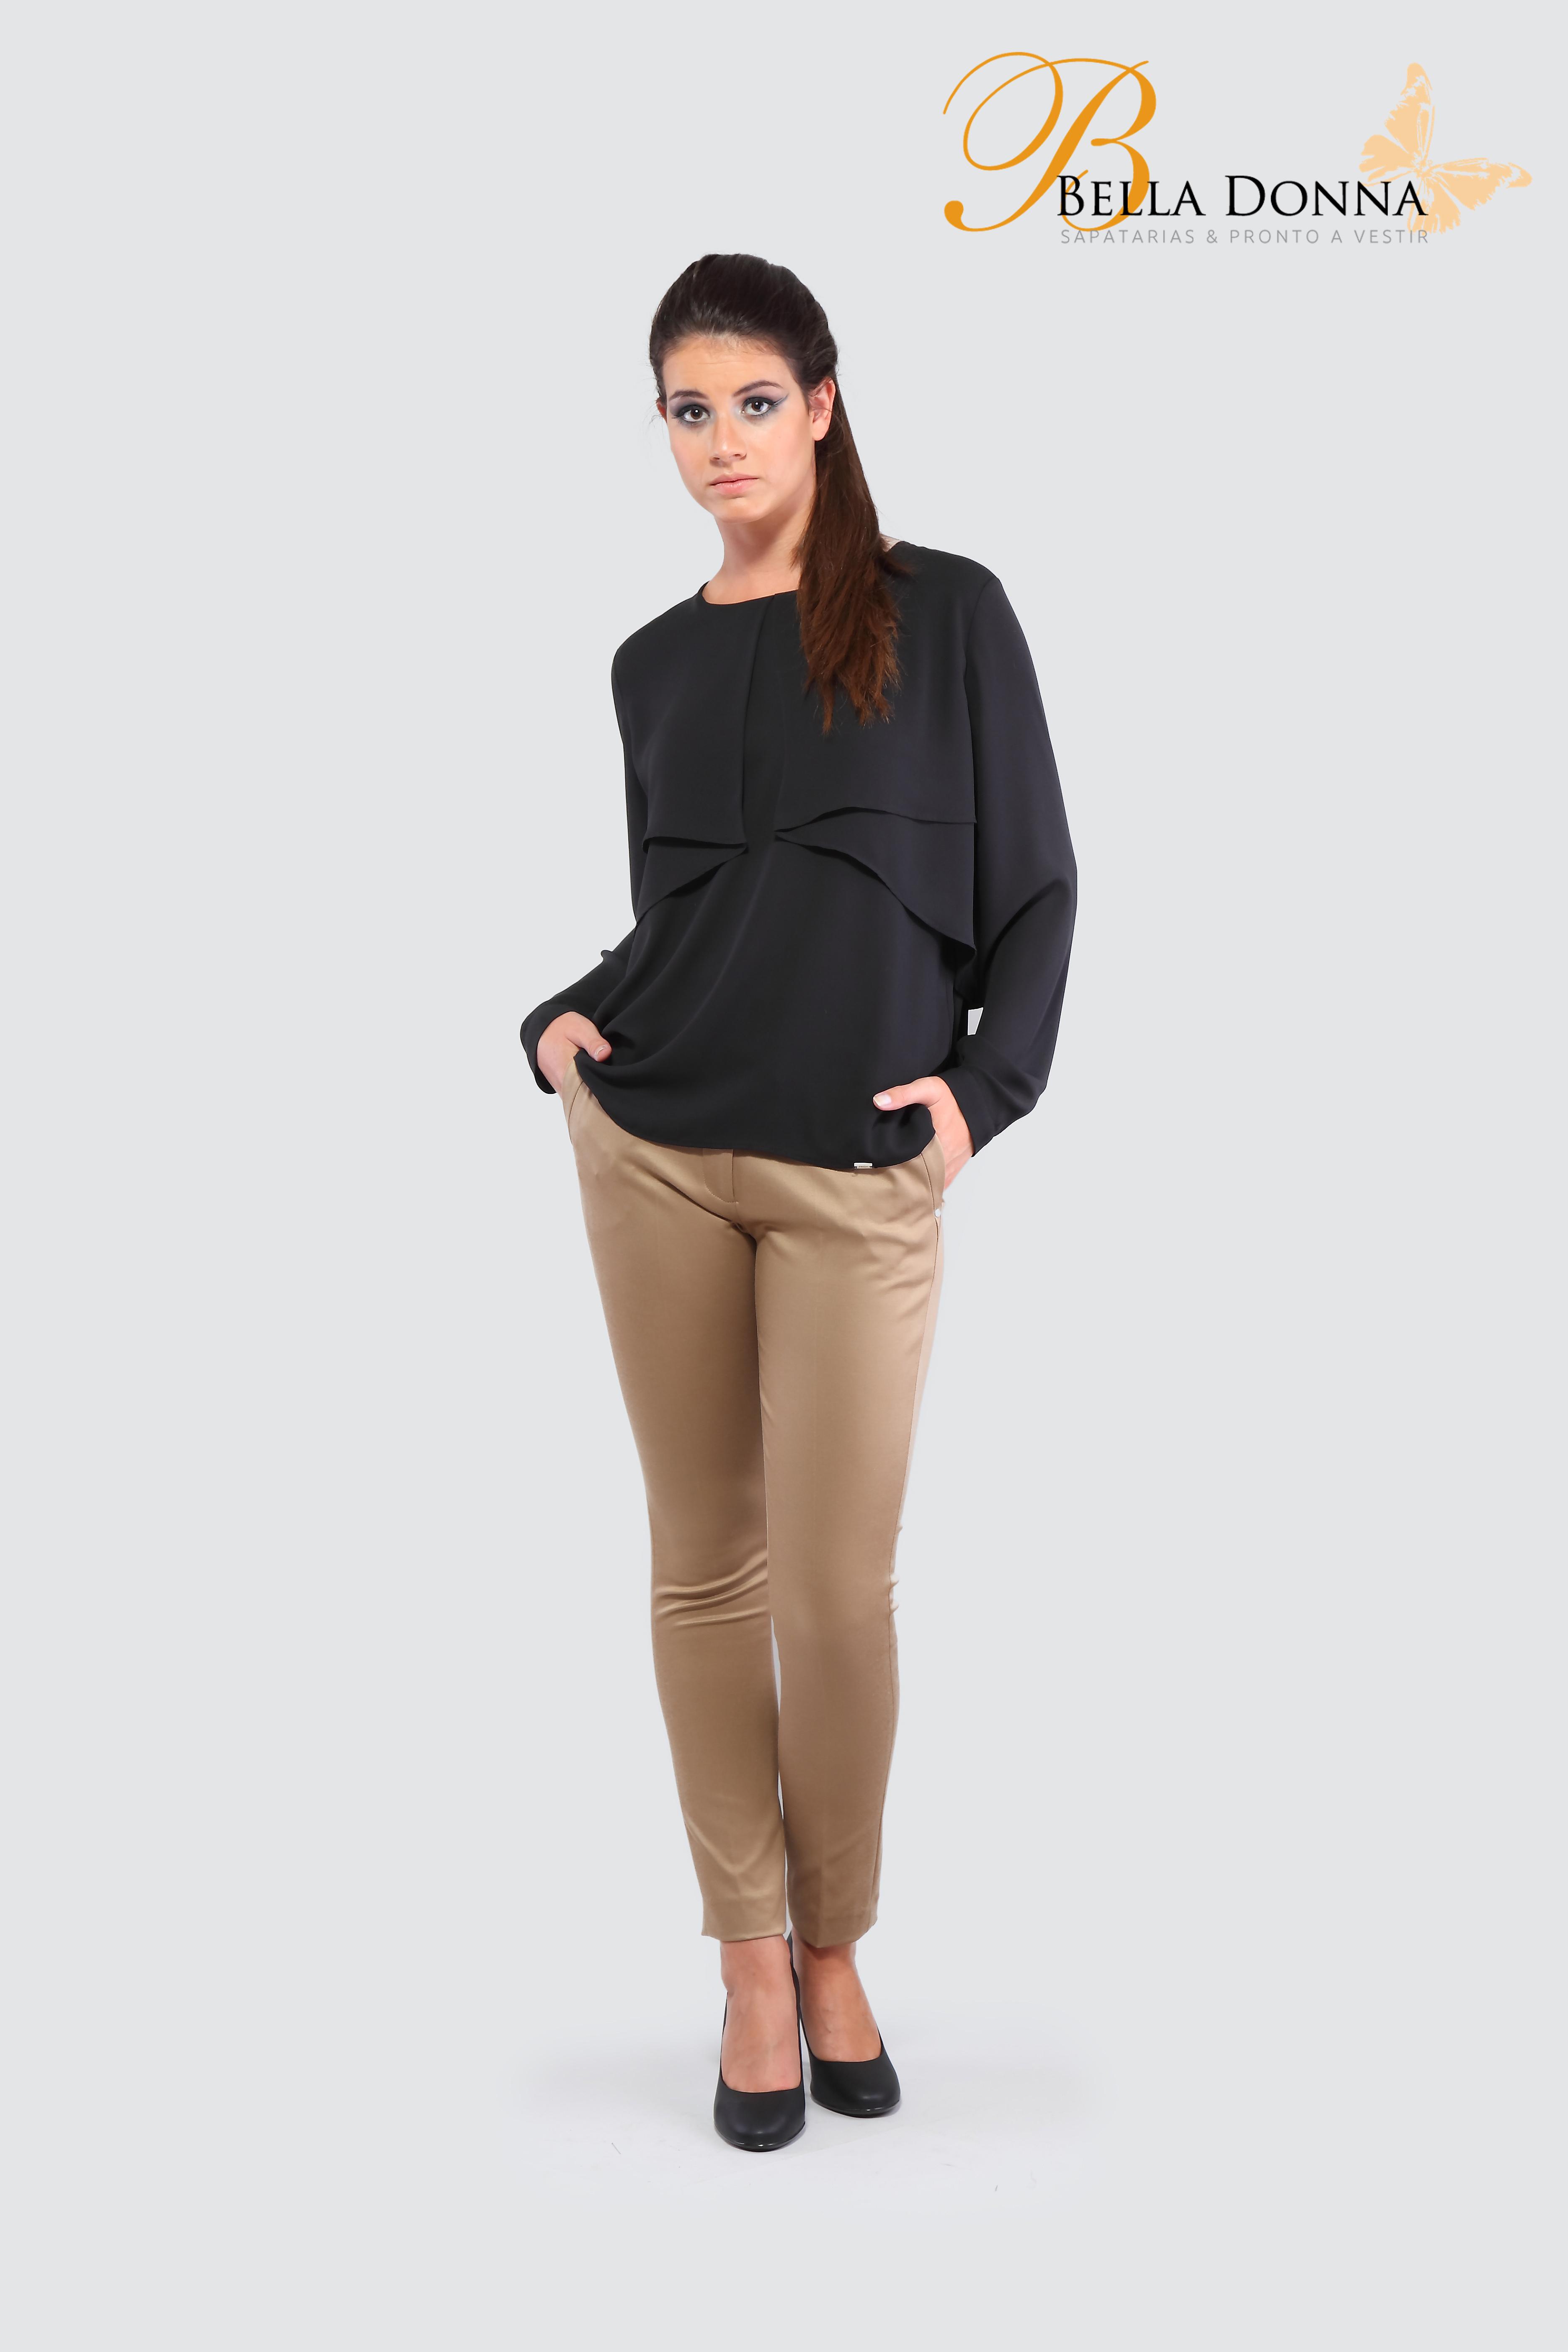 lojasbelladonna : Blusa Black Ferrache